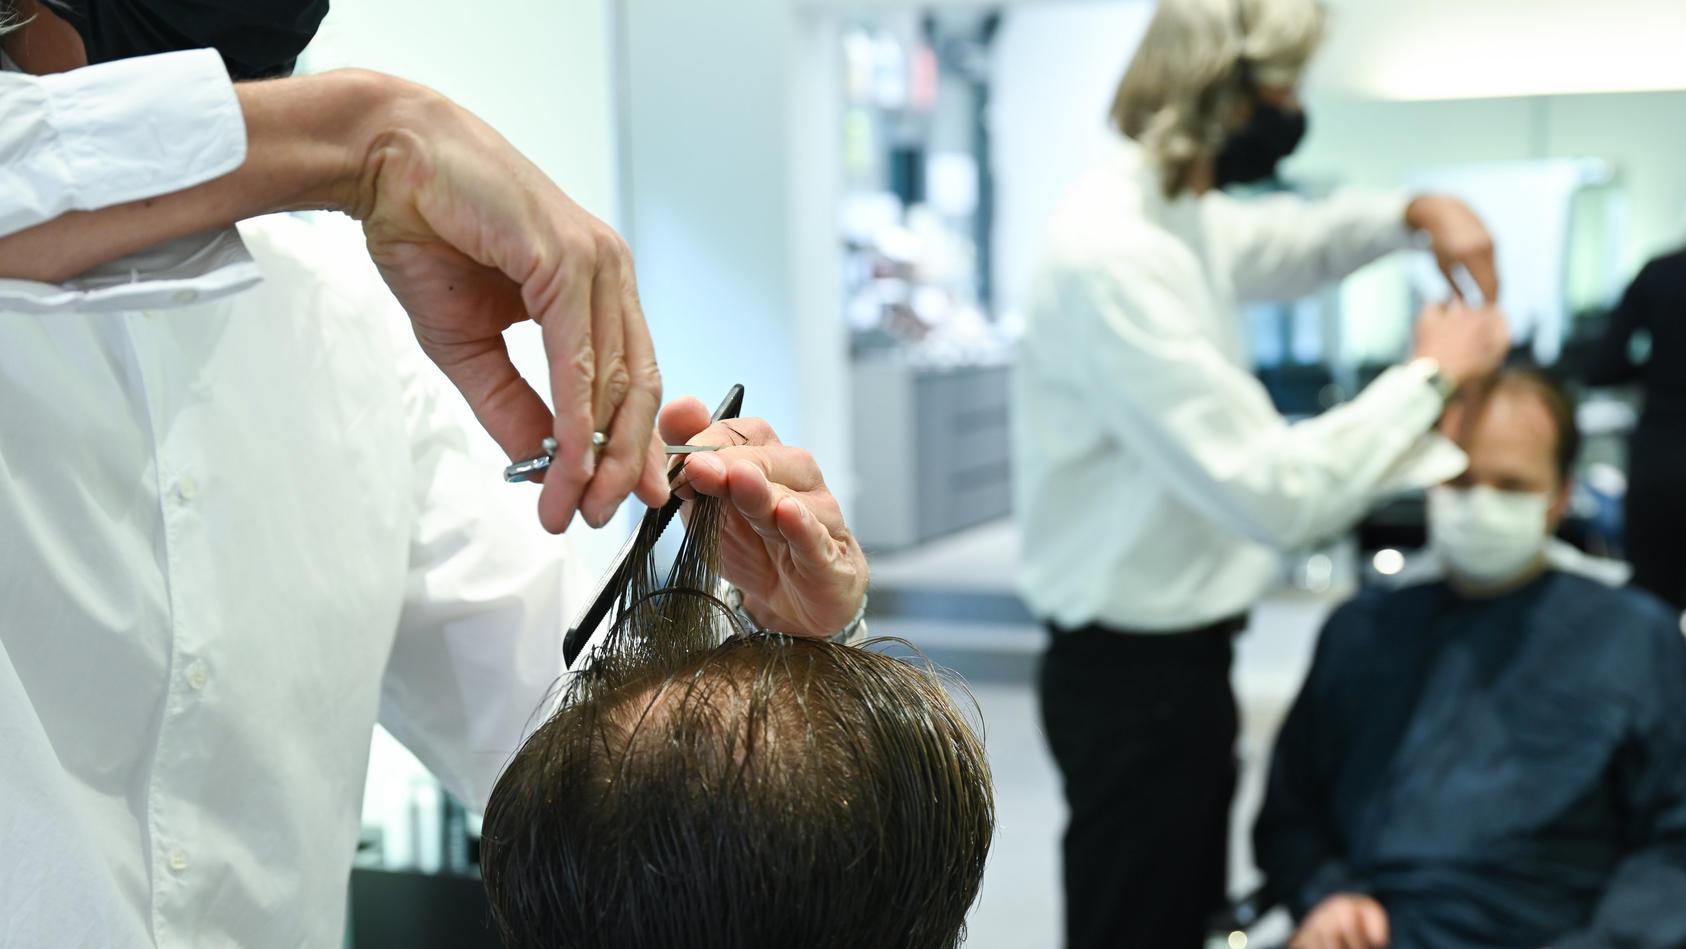 Wegen Corona fehlt in vielen Friseurbetrieben Personal.